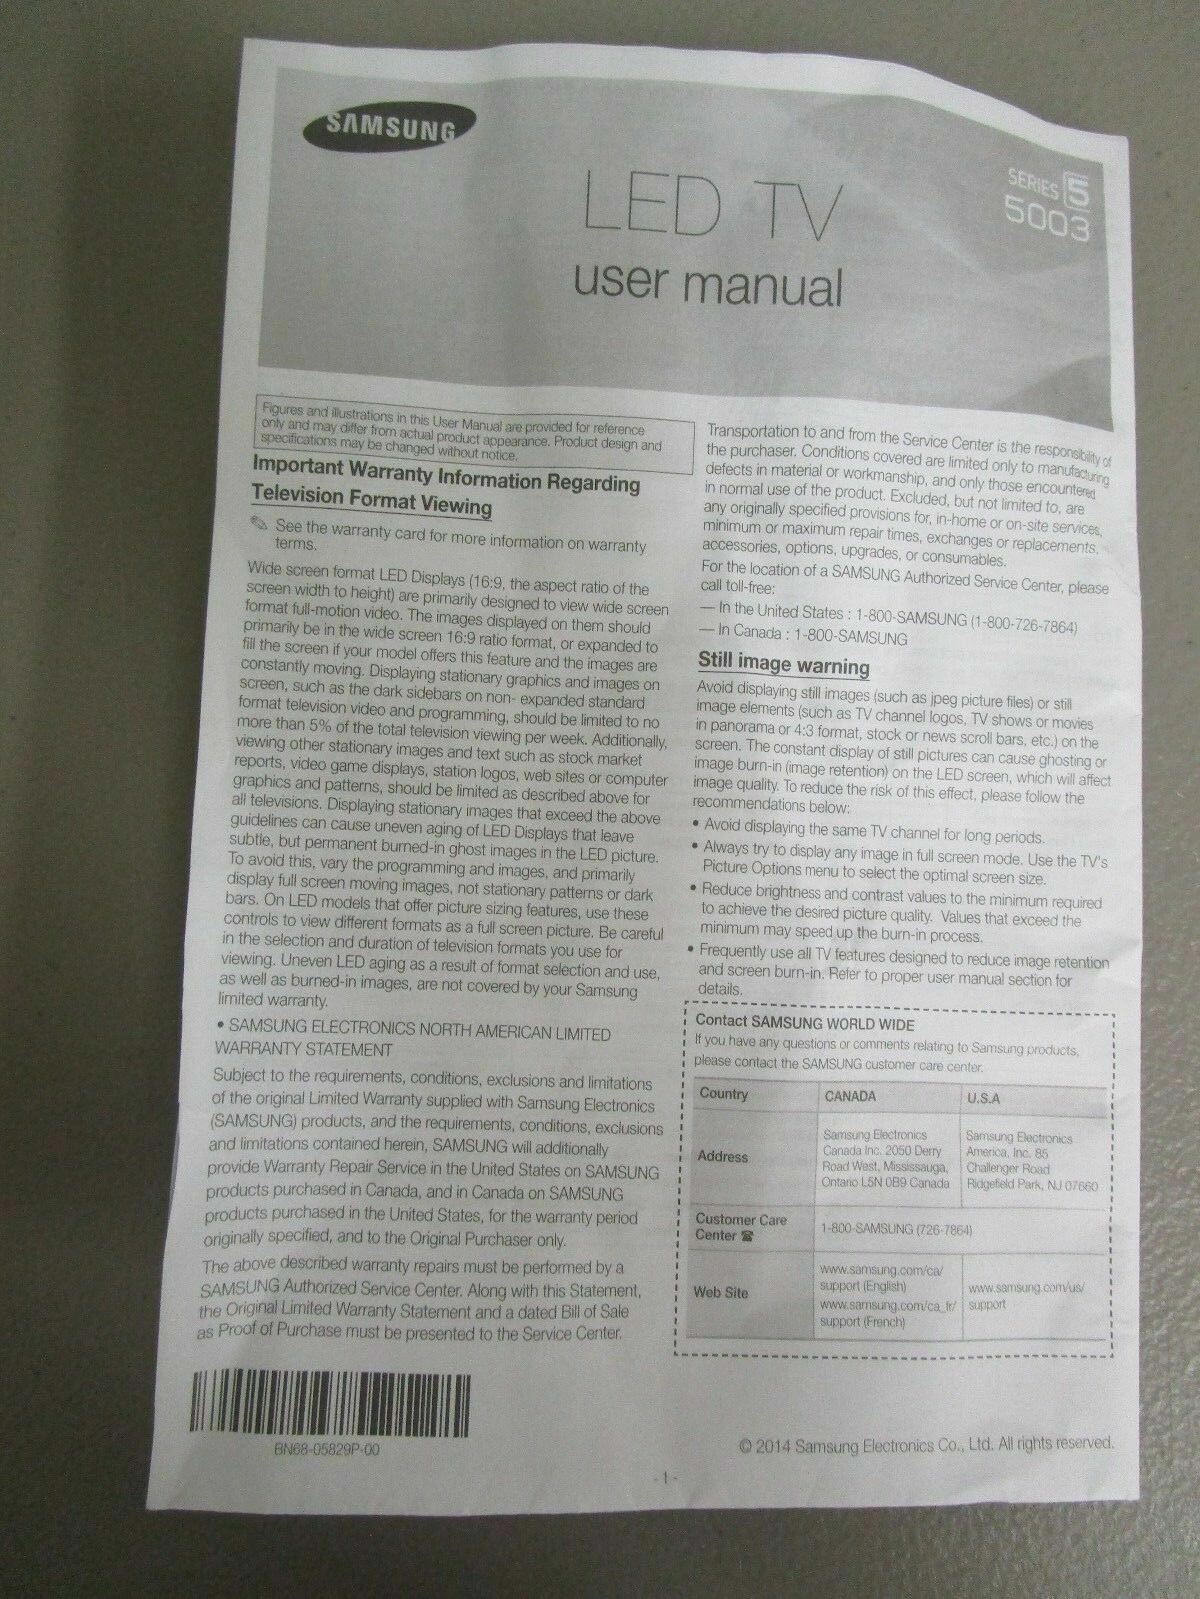 Samsung Series 5 5003 LED TV User Manual